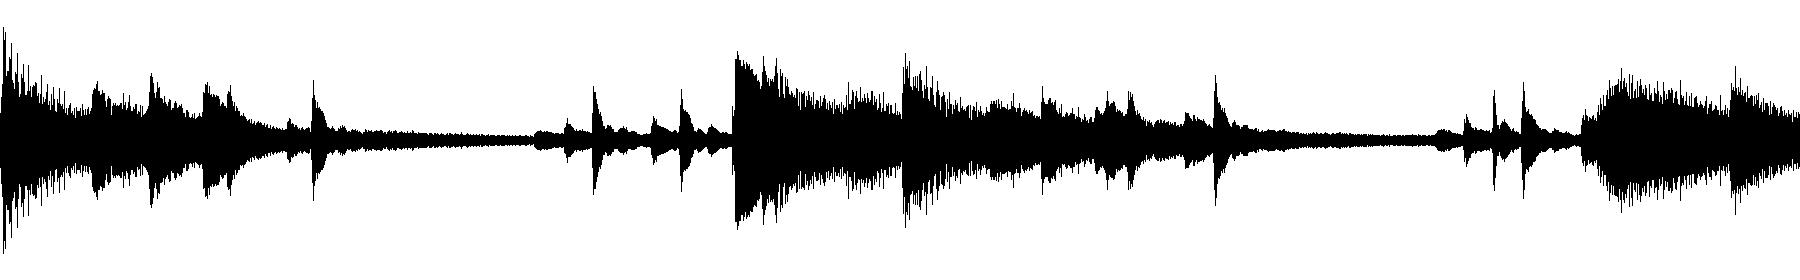 80 g piano youjacuzzi 03